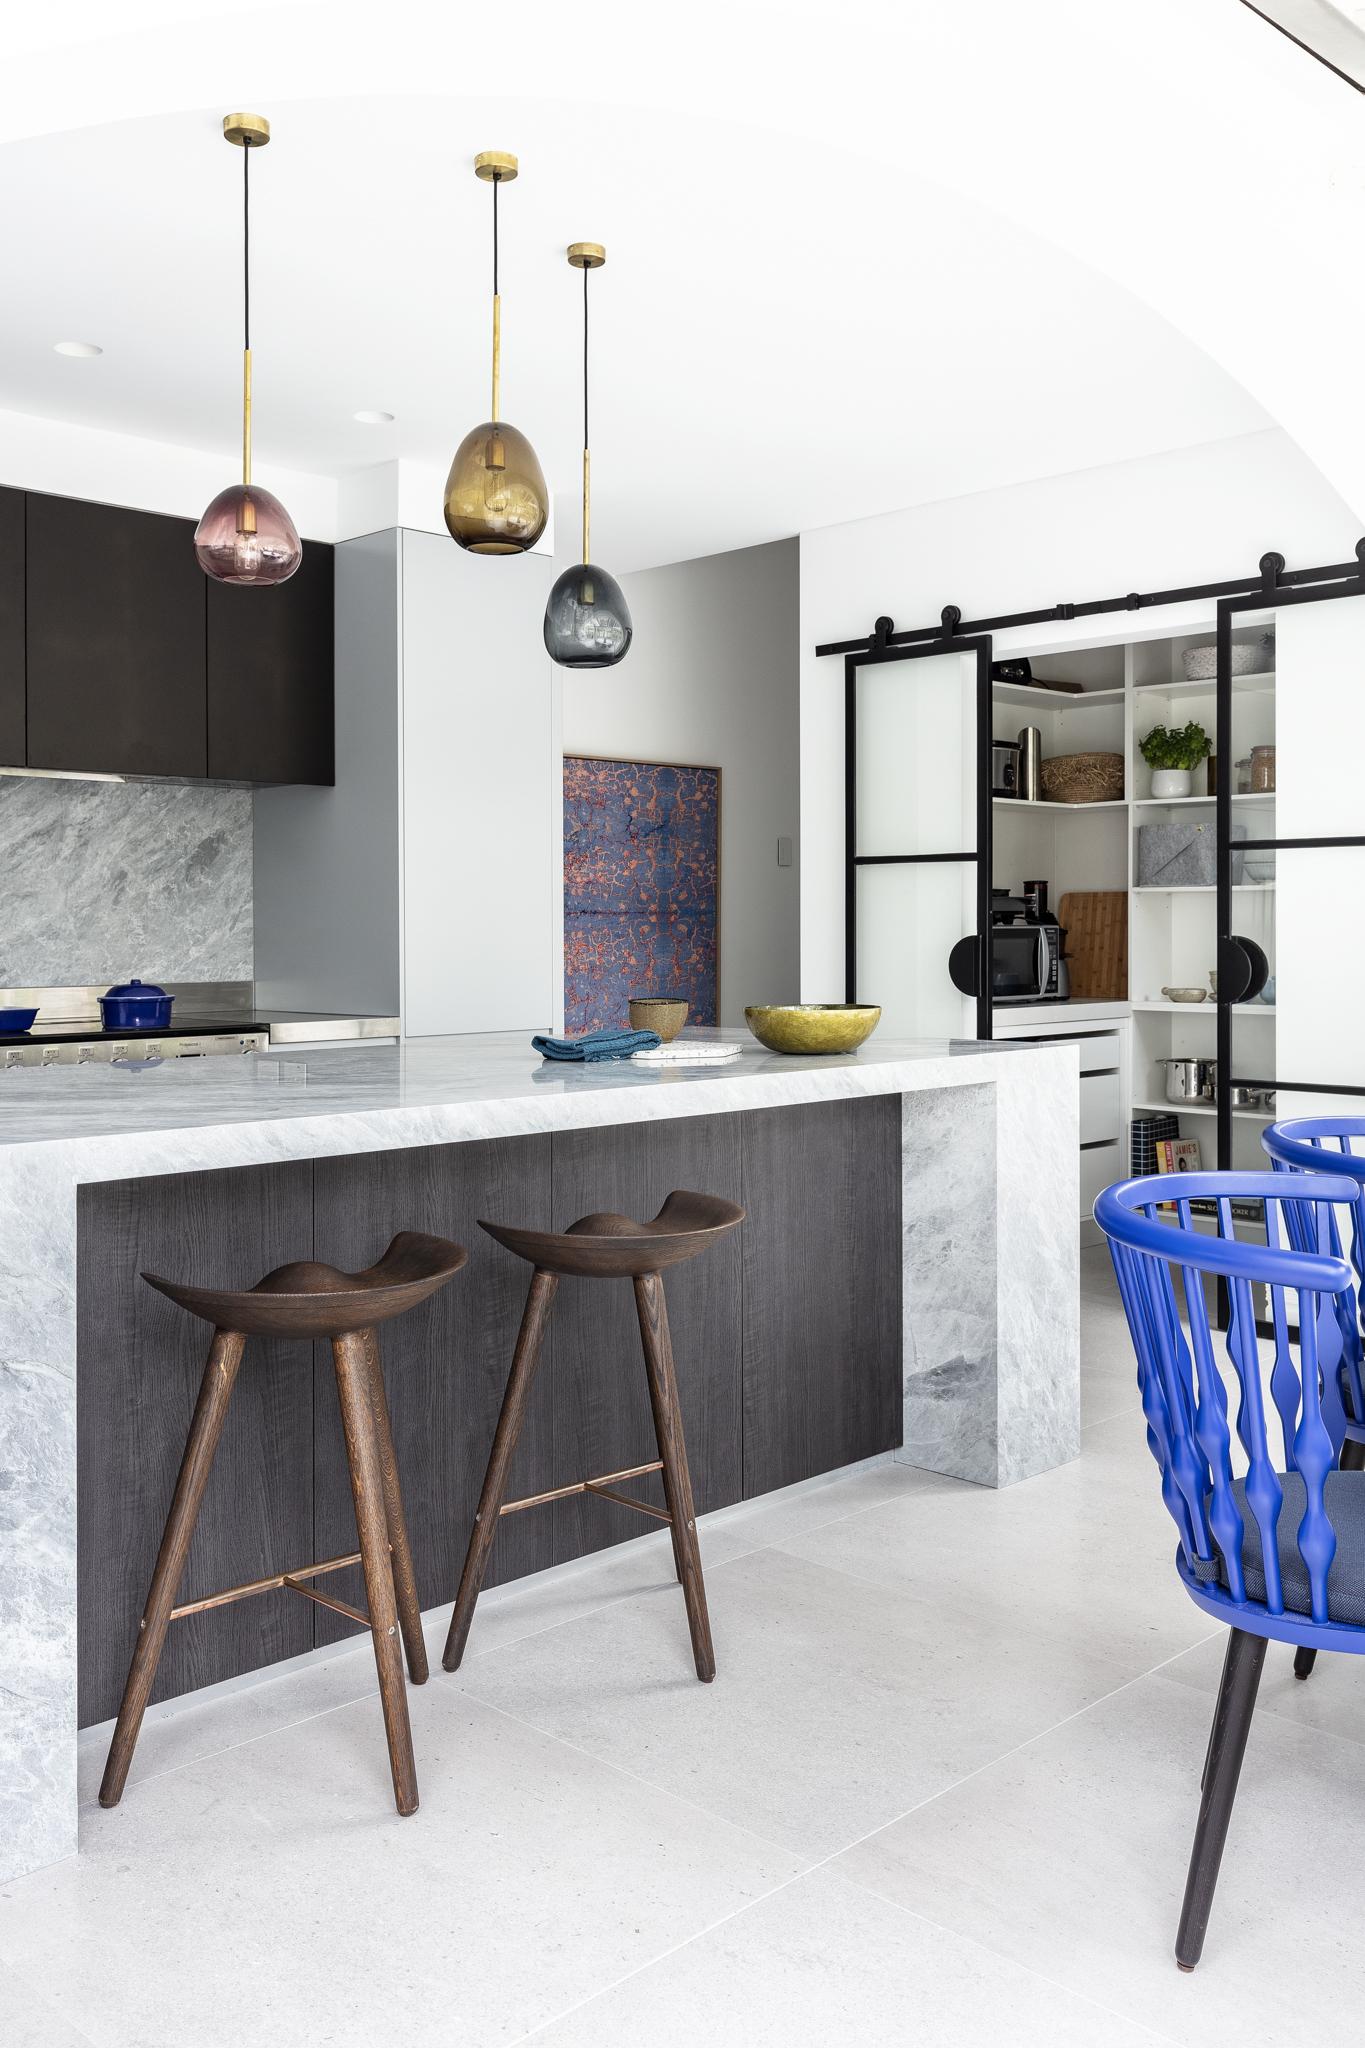 Sydney-North-Shore-Kitchen-Pendant-Lights-Feature-Blue-Armchairs.jpg